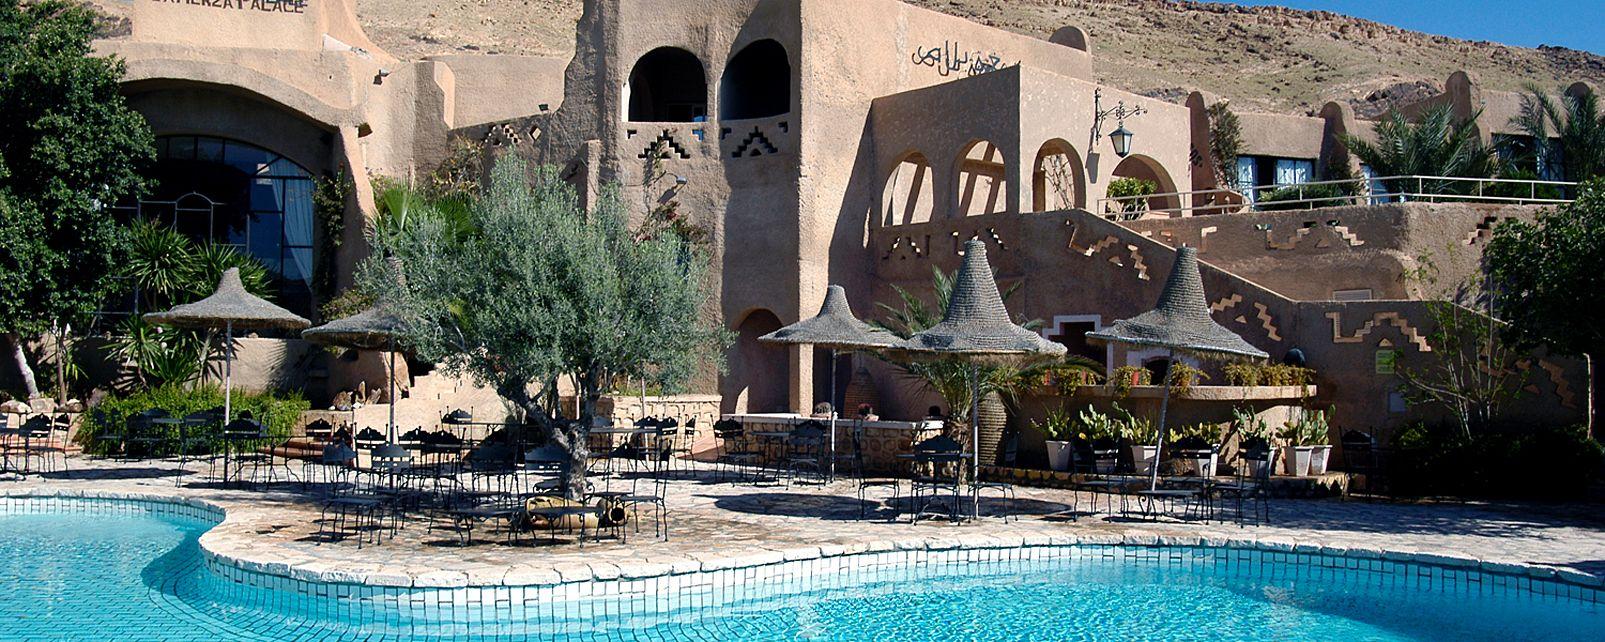 Hotel Tamerza Palace & Spa